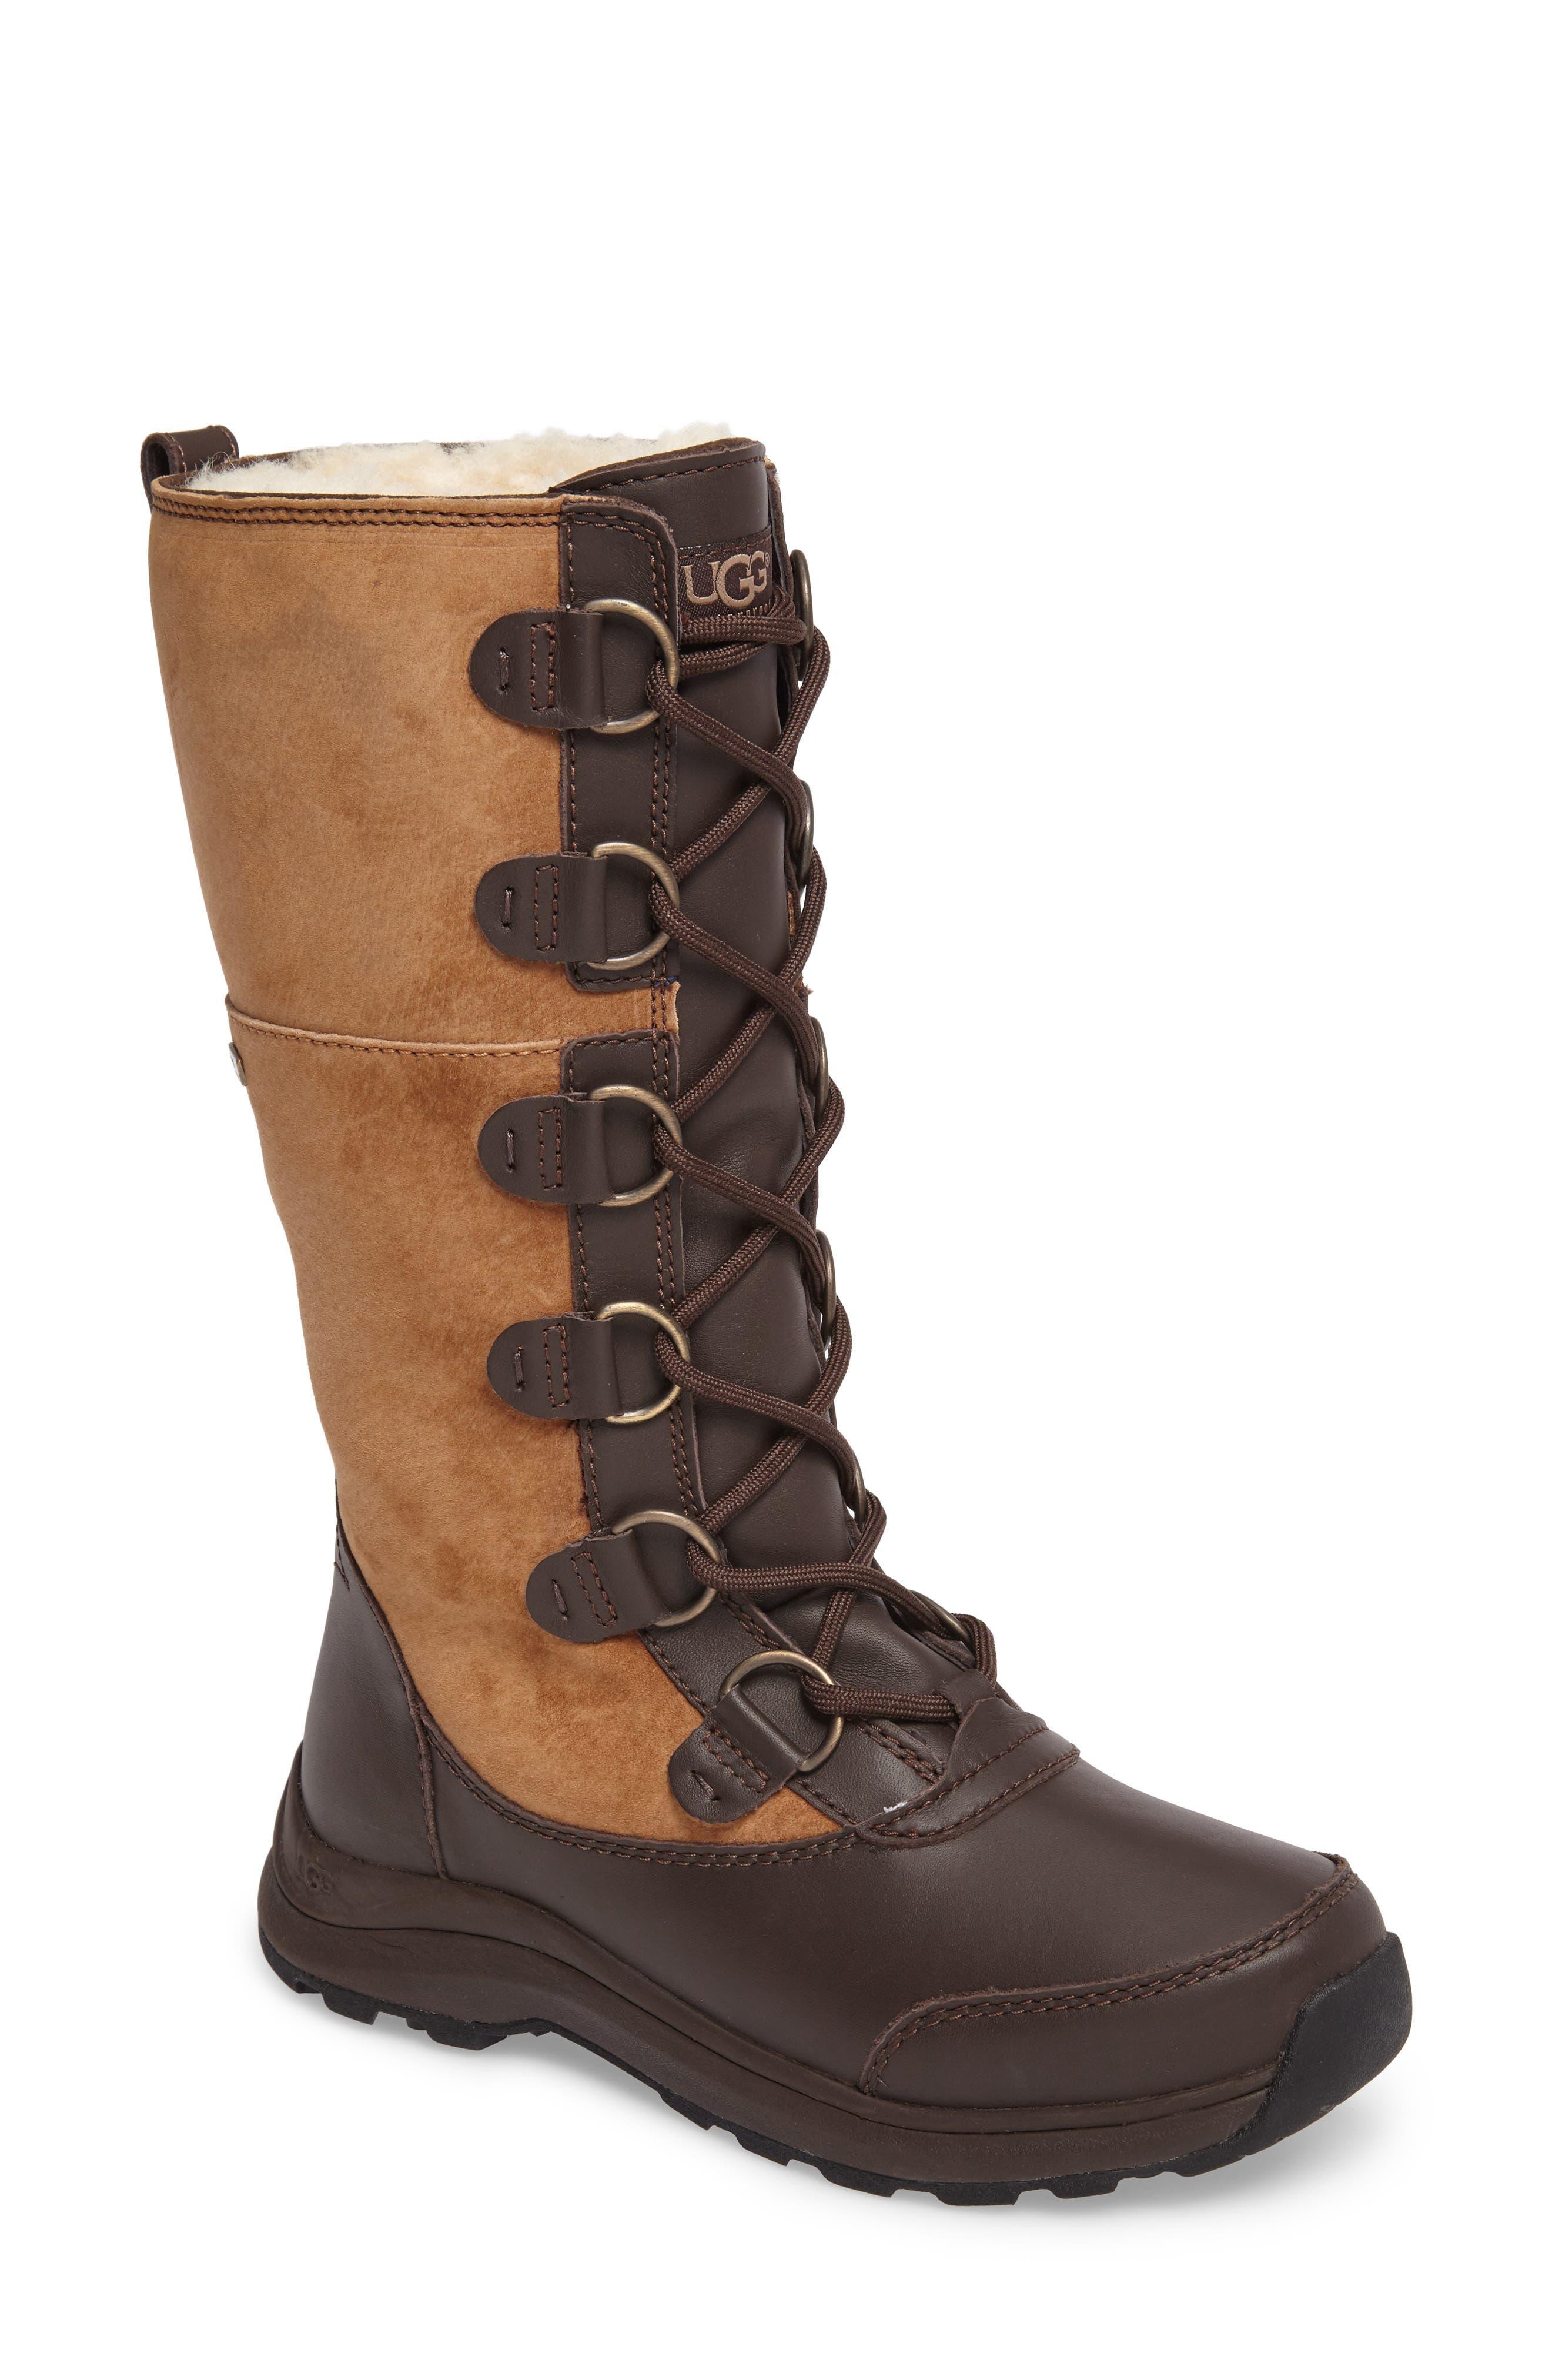 Alternate Image 1 Selected - UGG® Atlason Waterproof Boot (Women)